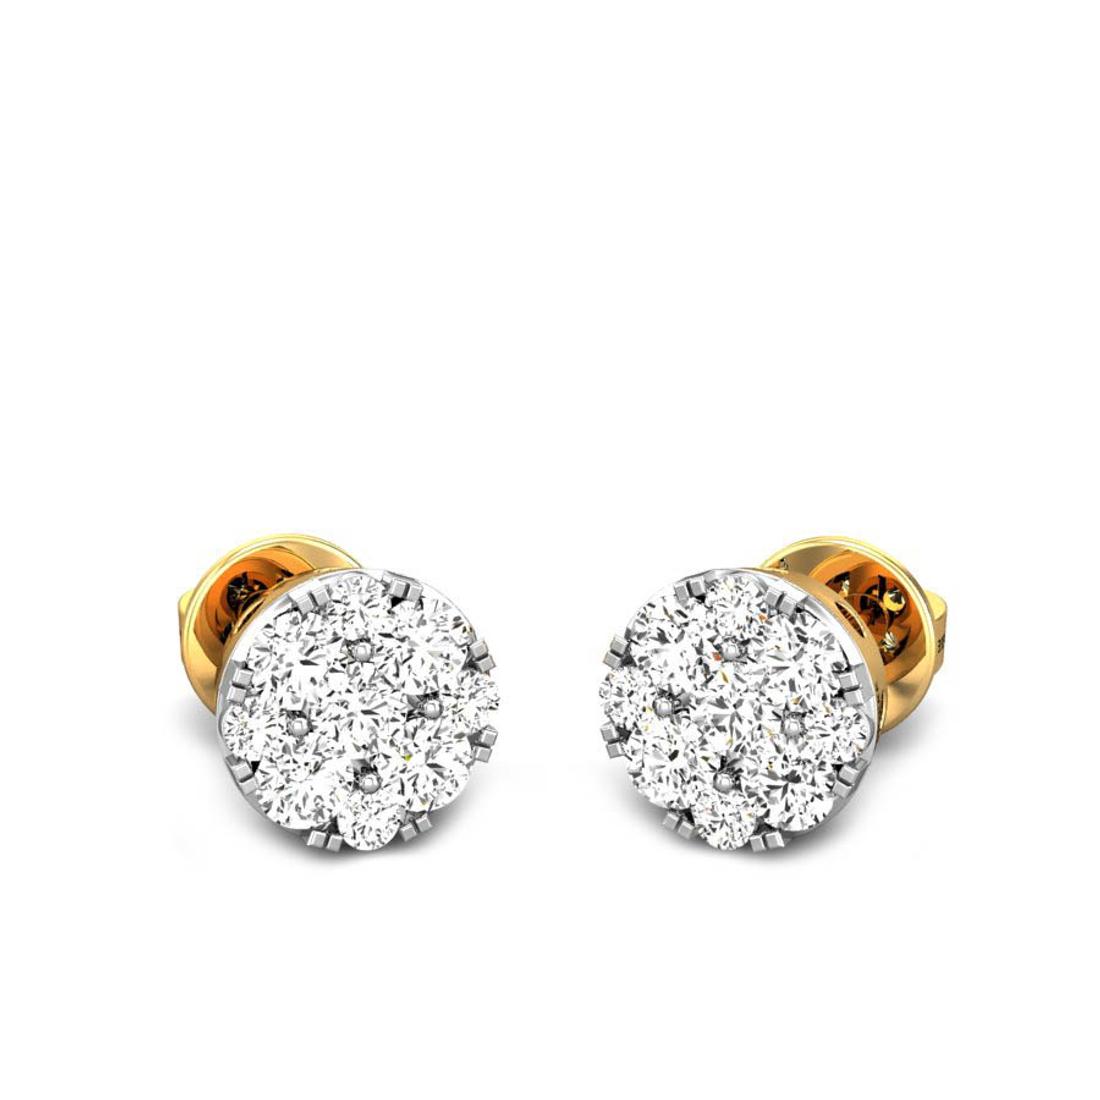 Candere by Kalyan Jewellers Yellow Gold Lucrecia Ziah Diamond Earrings for Women (IGI Certified Diamonds)